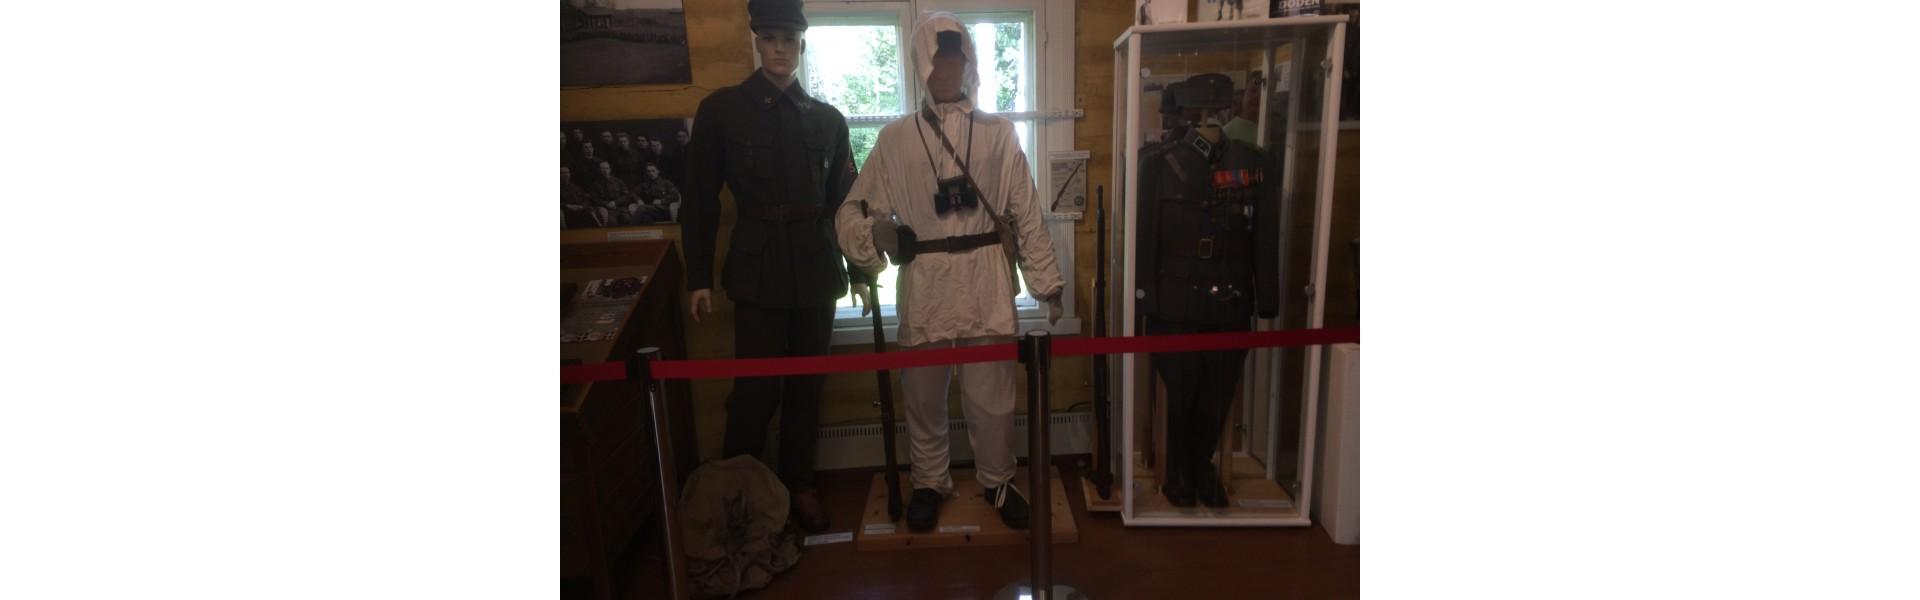 Iron Curtain Trail (6 days/ 210 km)